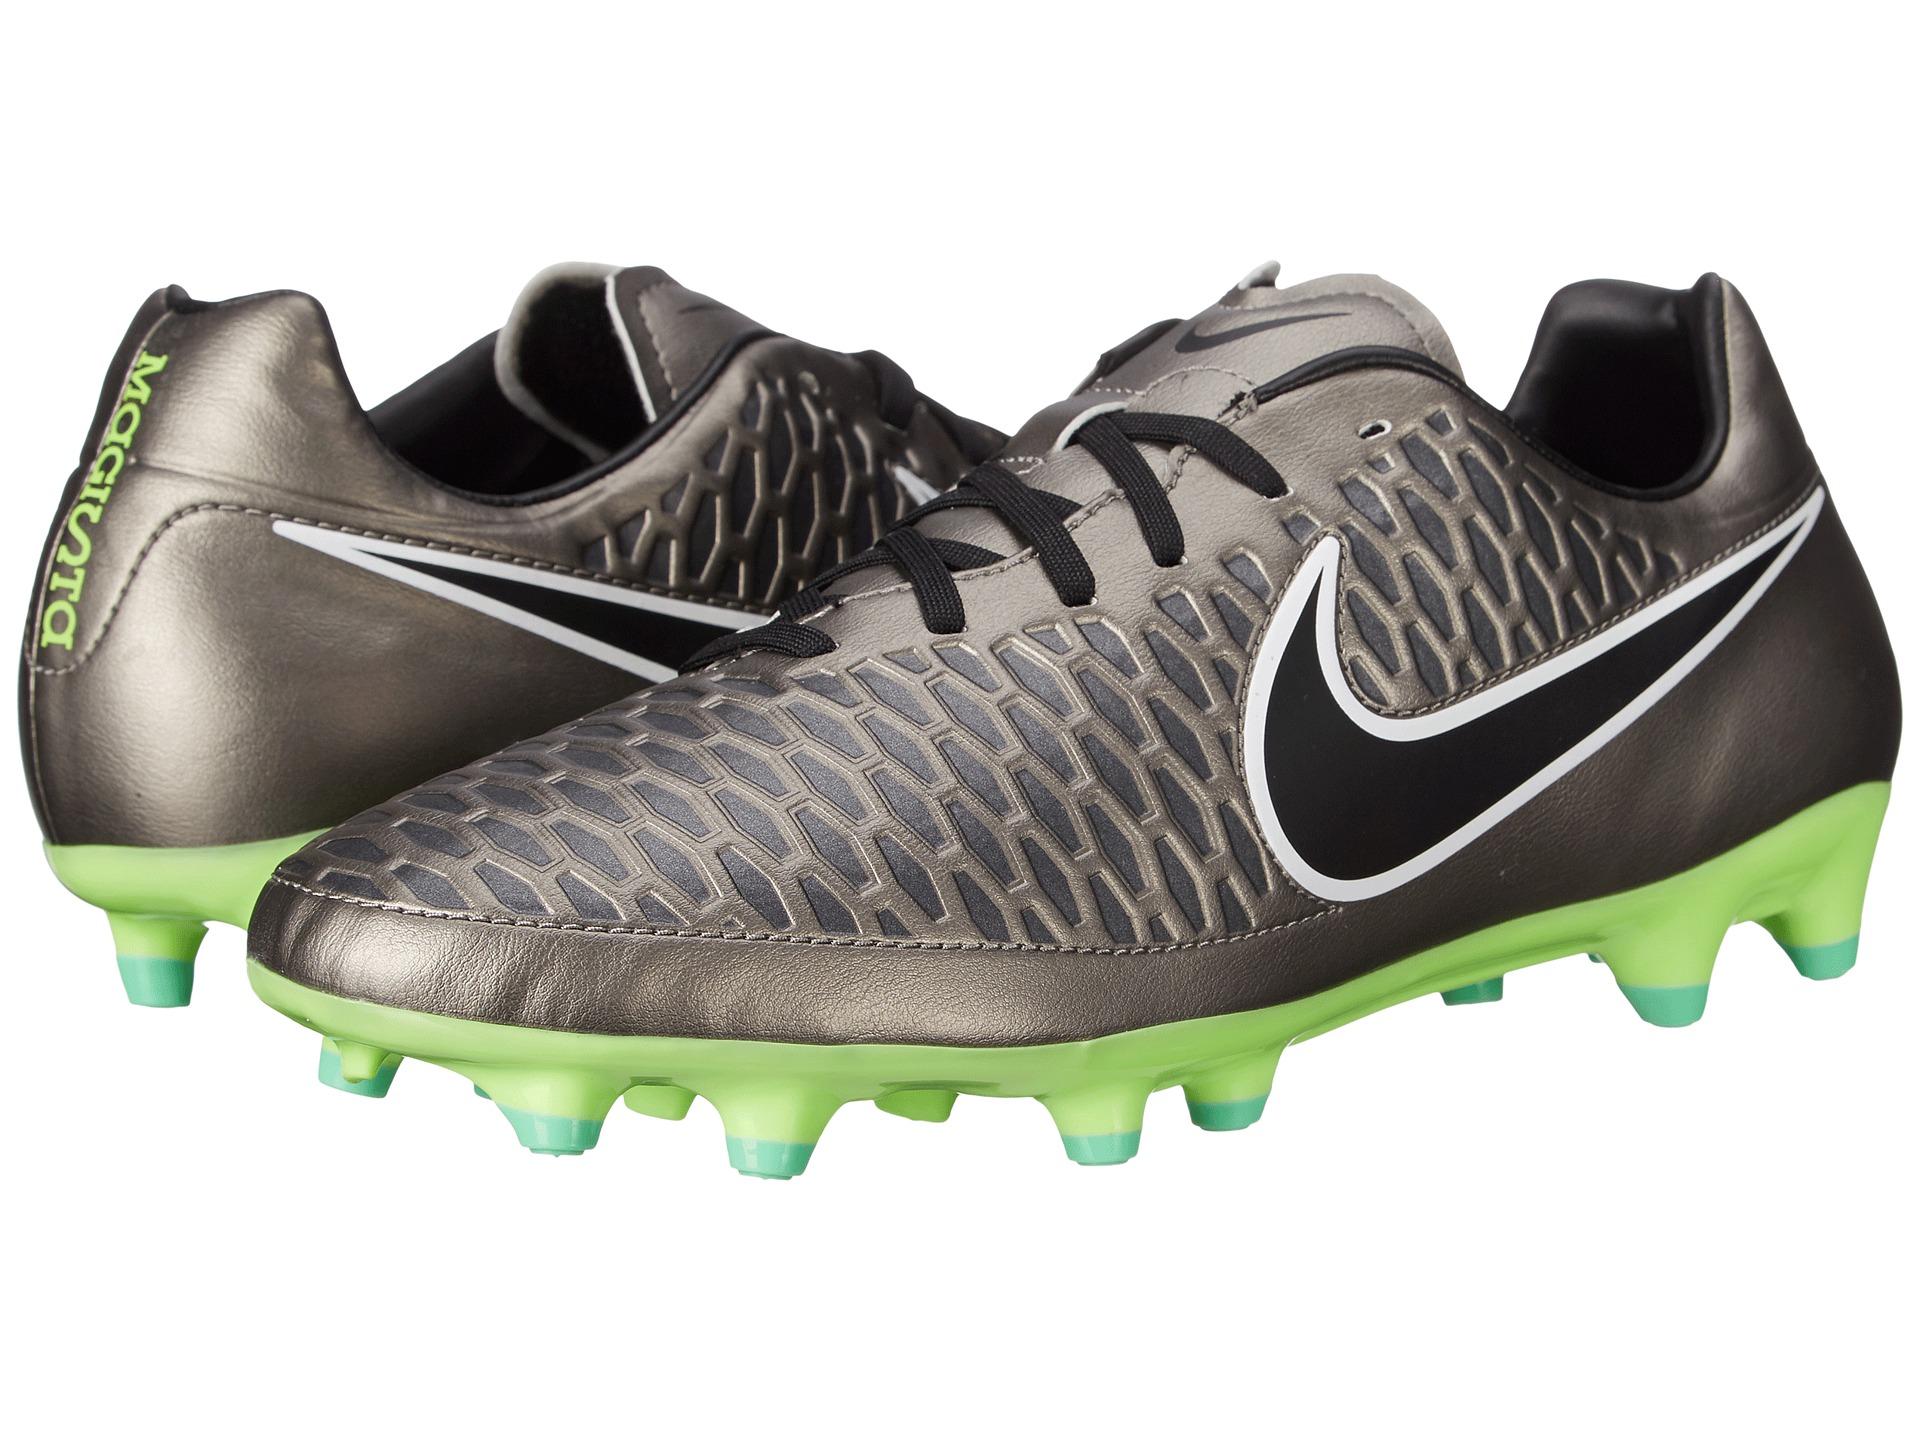 nike air max iv plus proche - Nike Magista Onda FG - 6pm.com